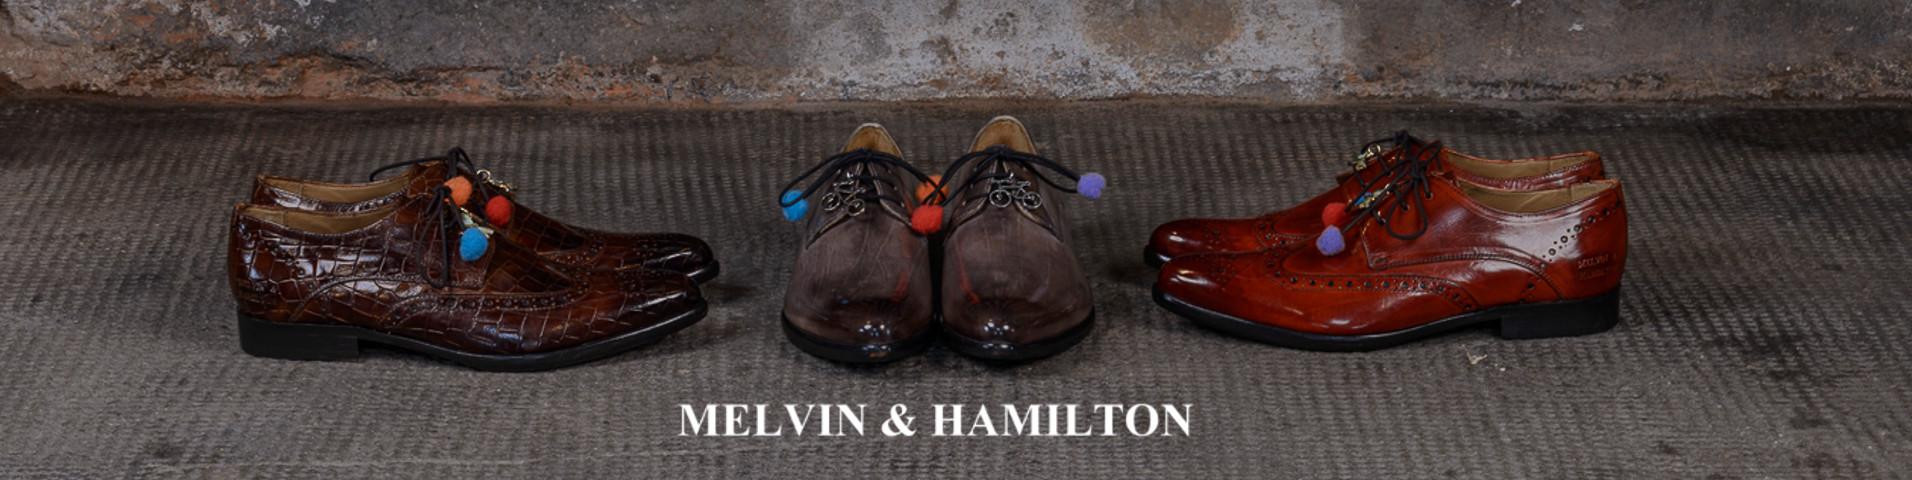 chaussures homme melvin hamilton large choix en ligne. Black Bedroom Furniture Sets. Home Design Ideas